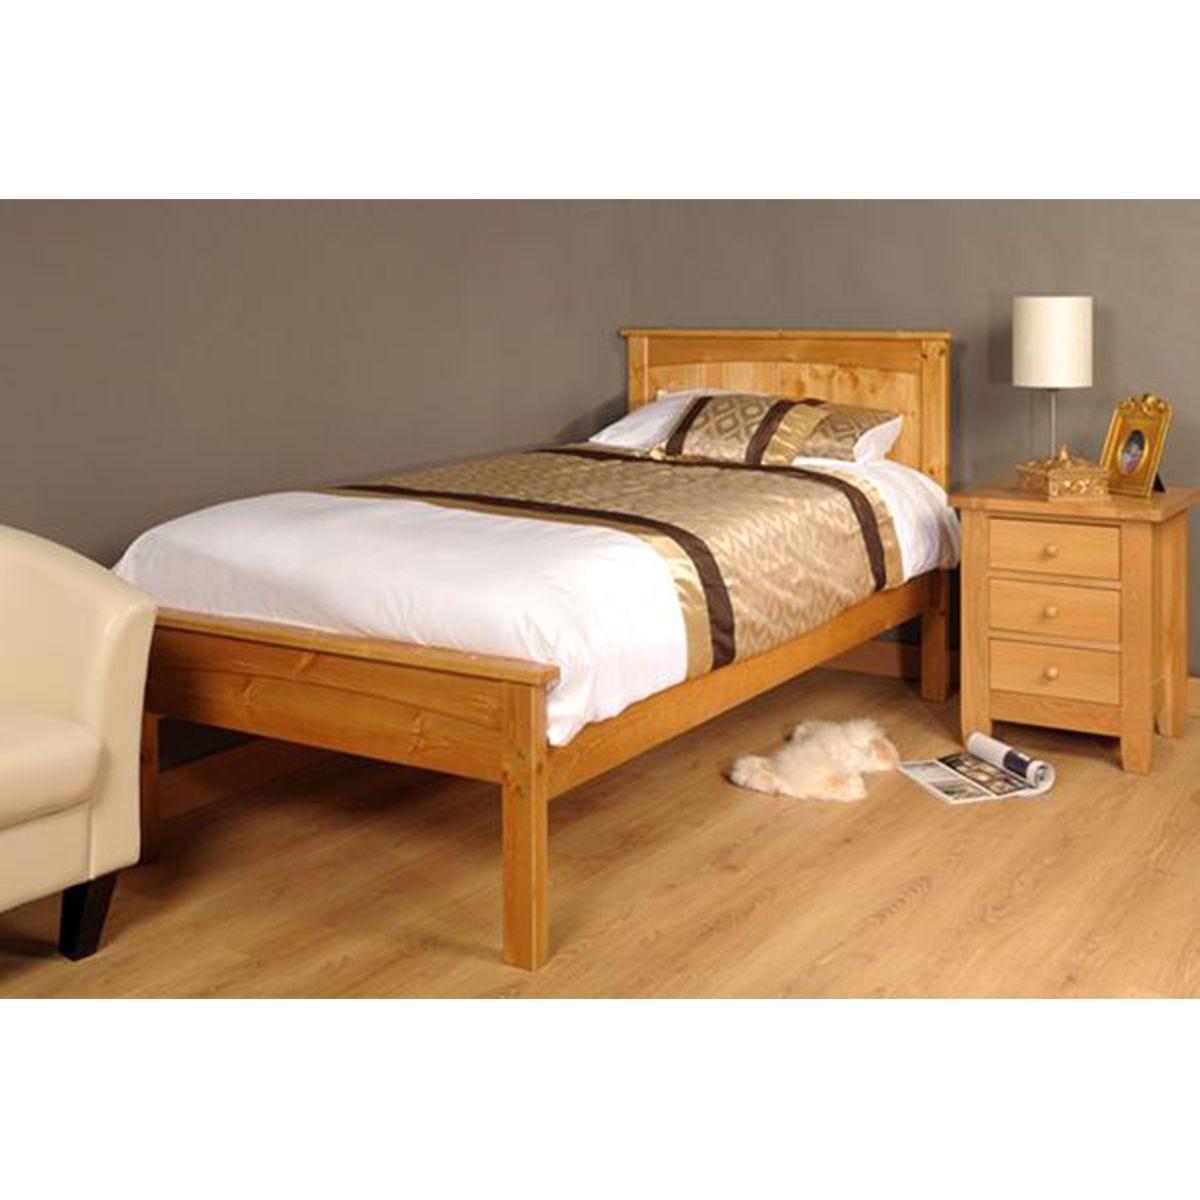 Ludza Bed Frame - Caramel